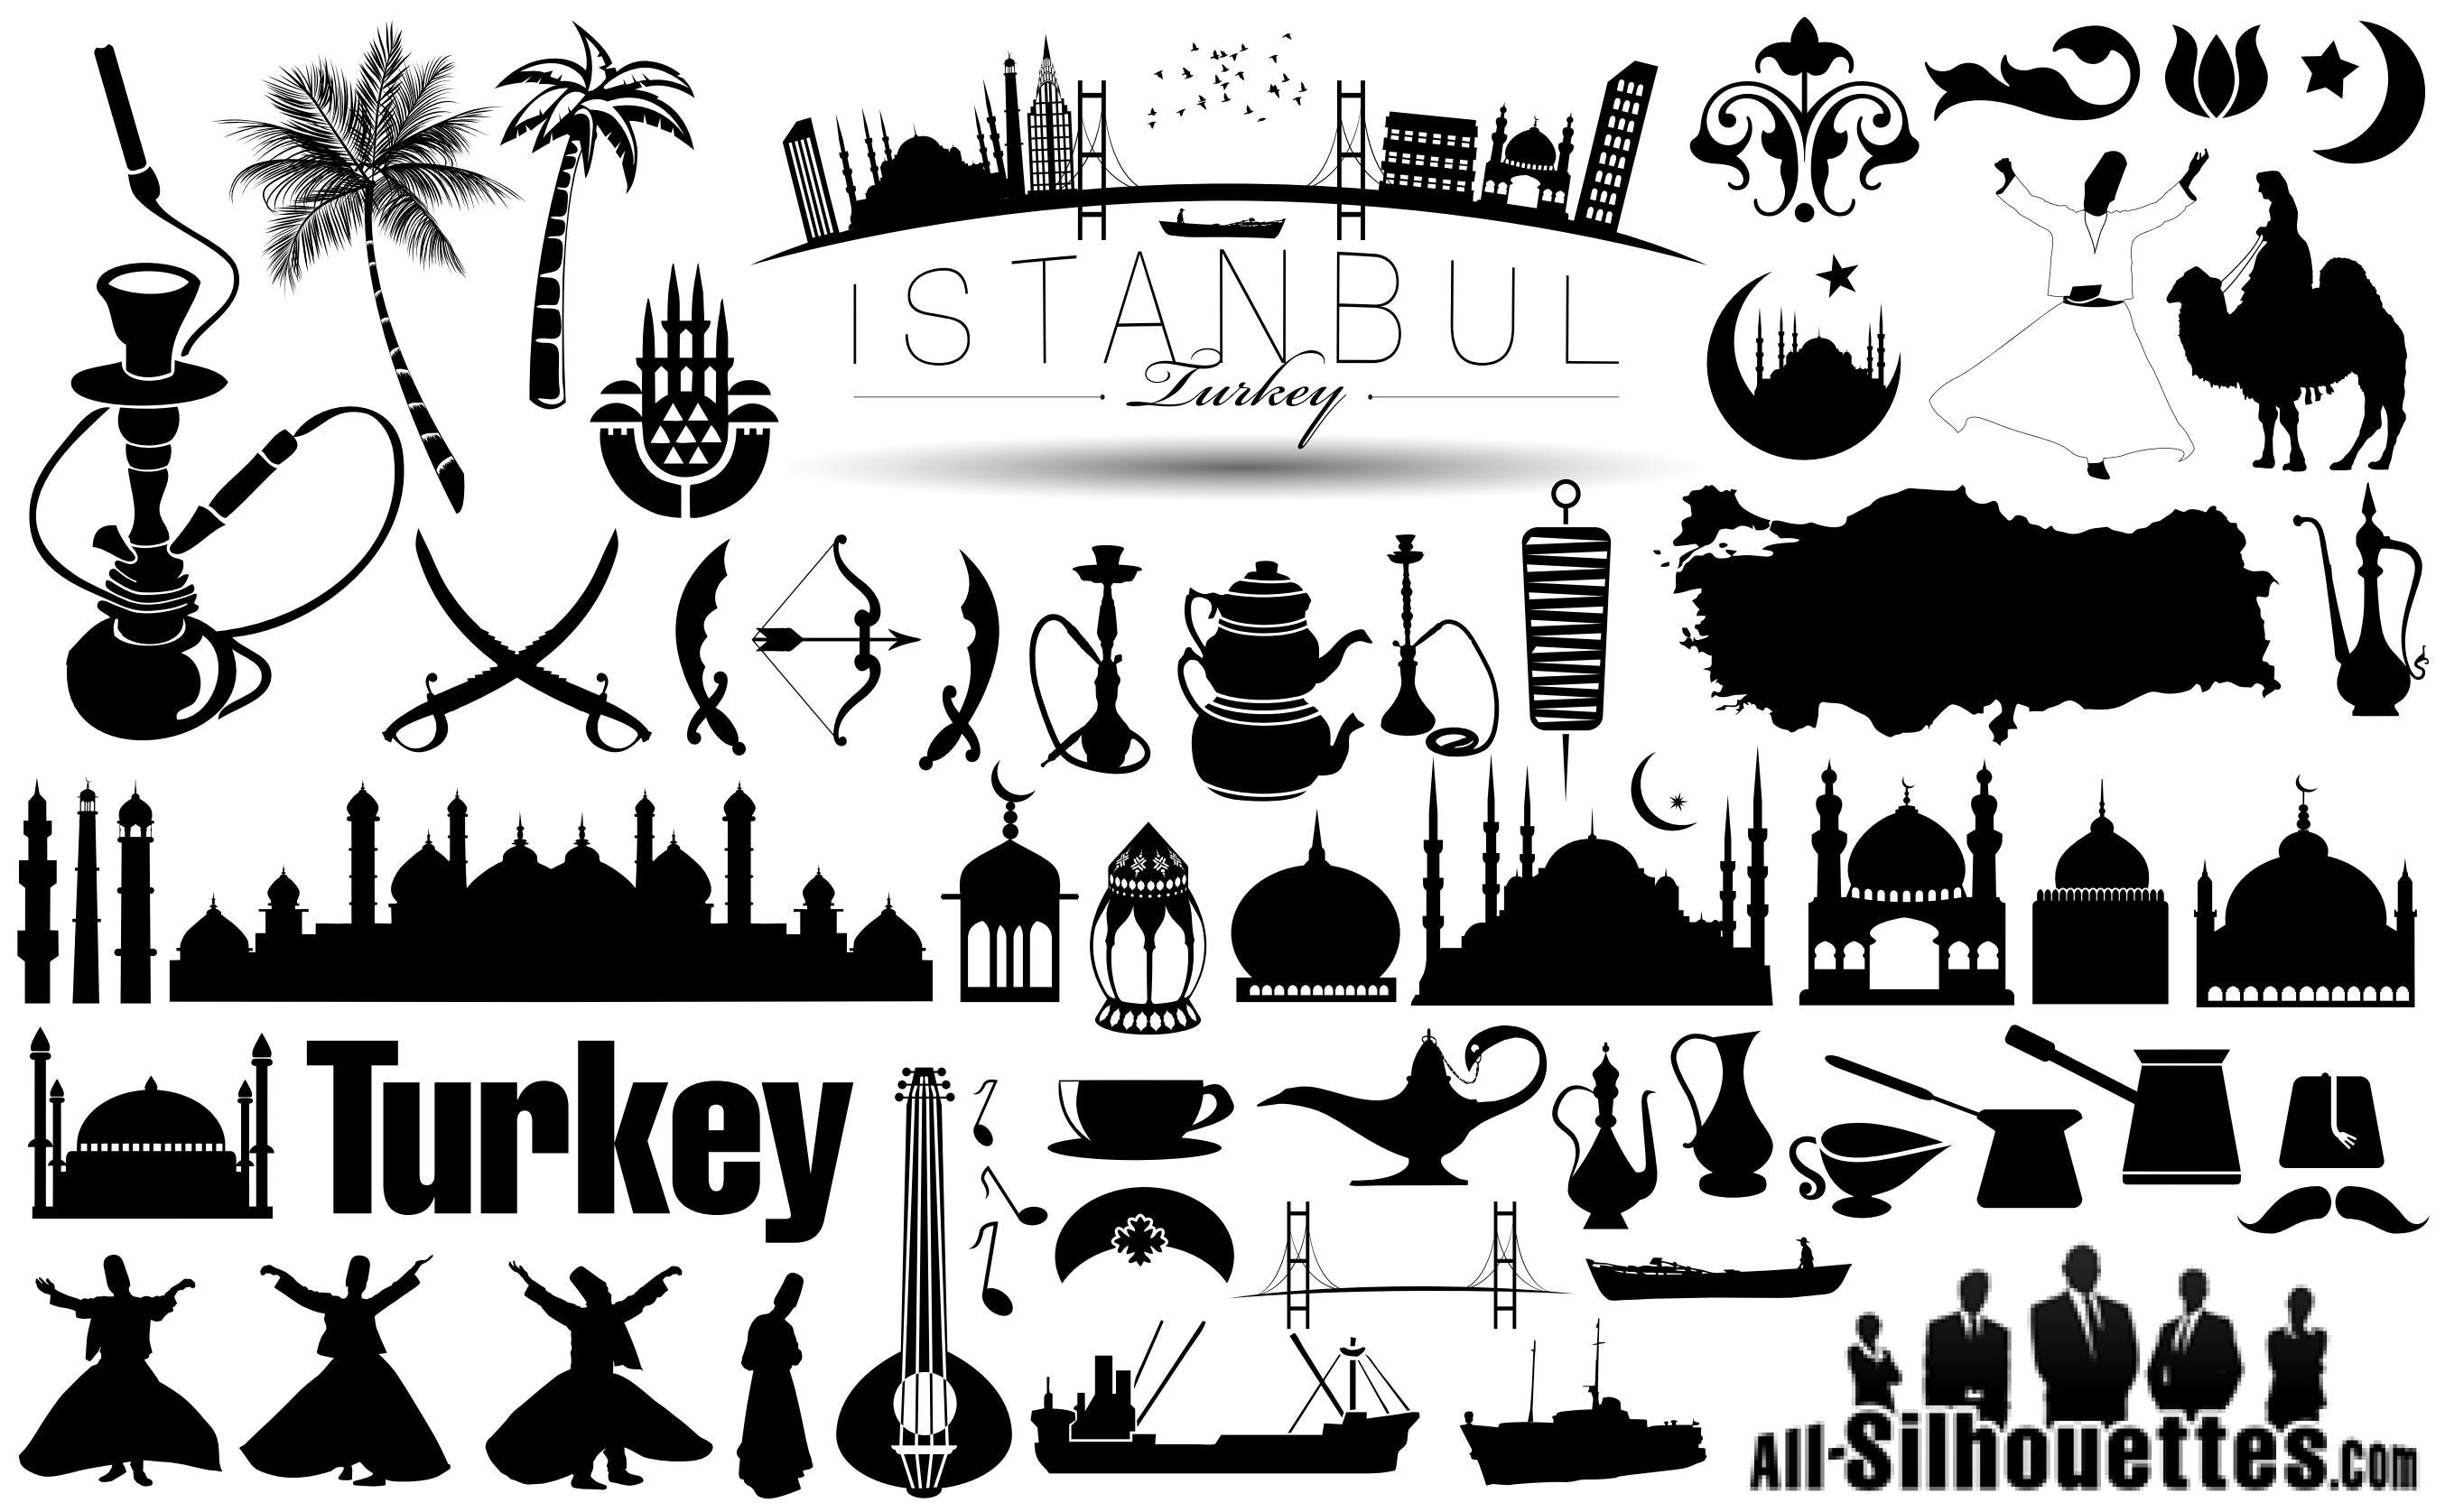 turkey_istanbul_vector_icons